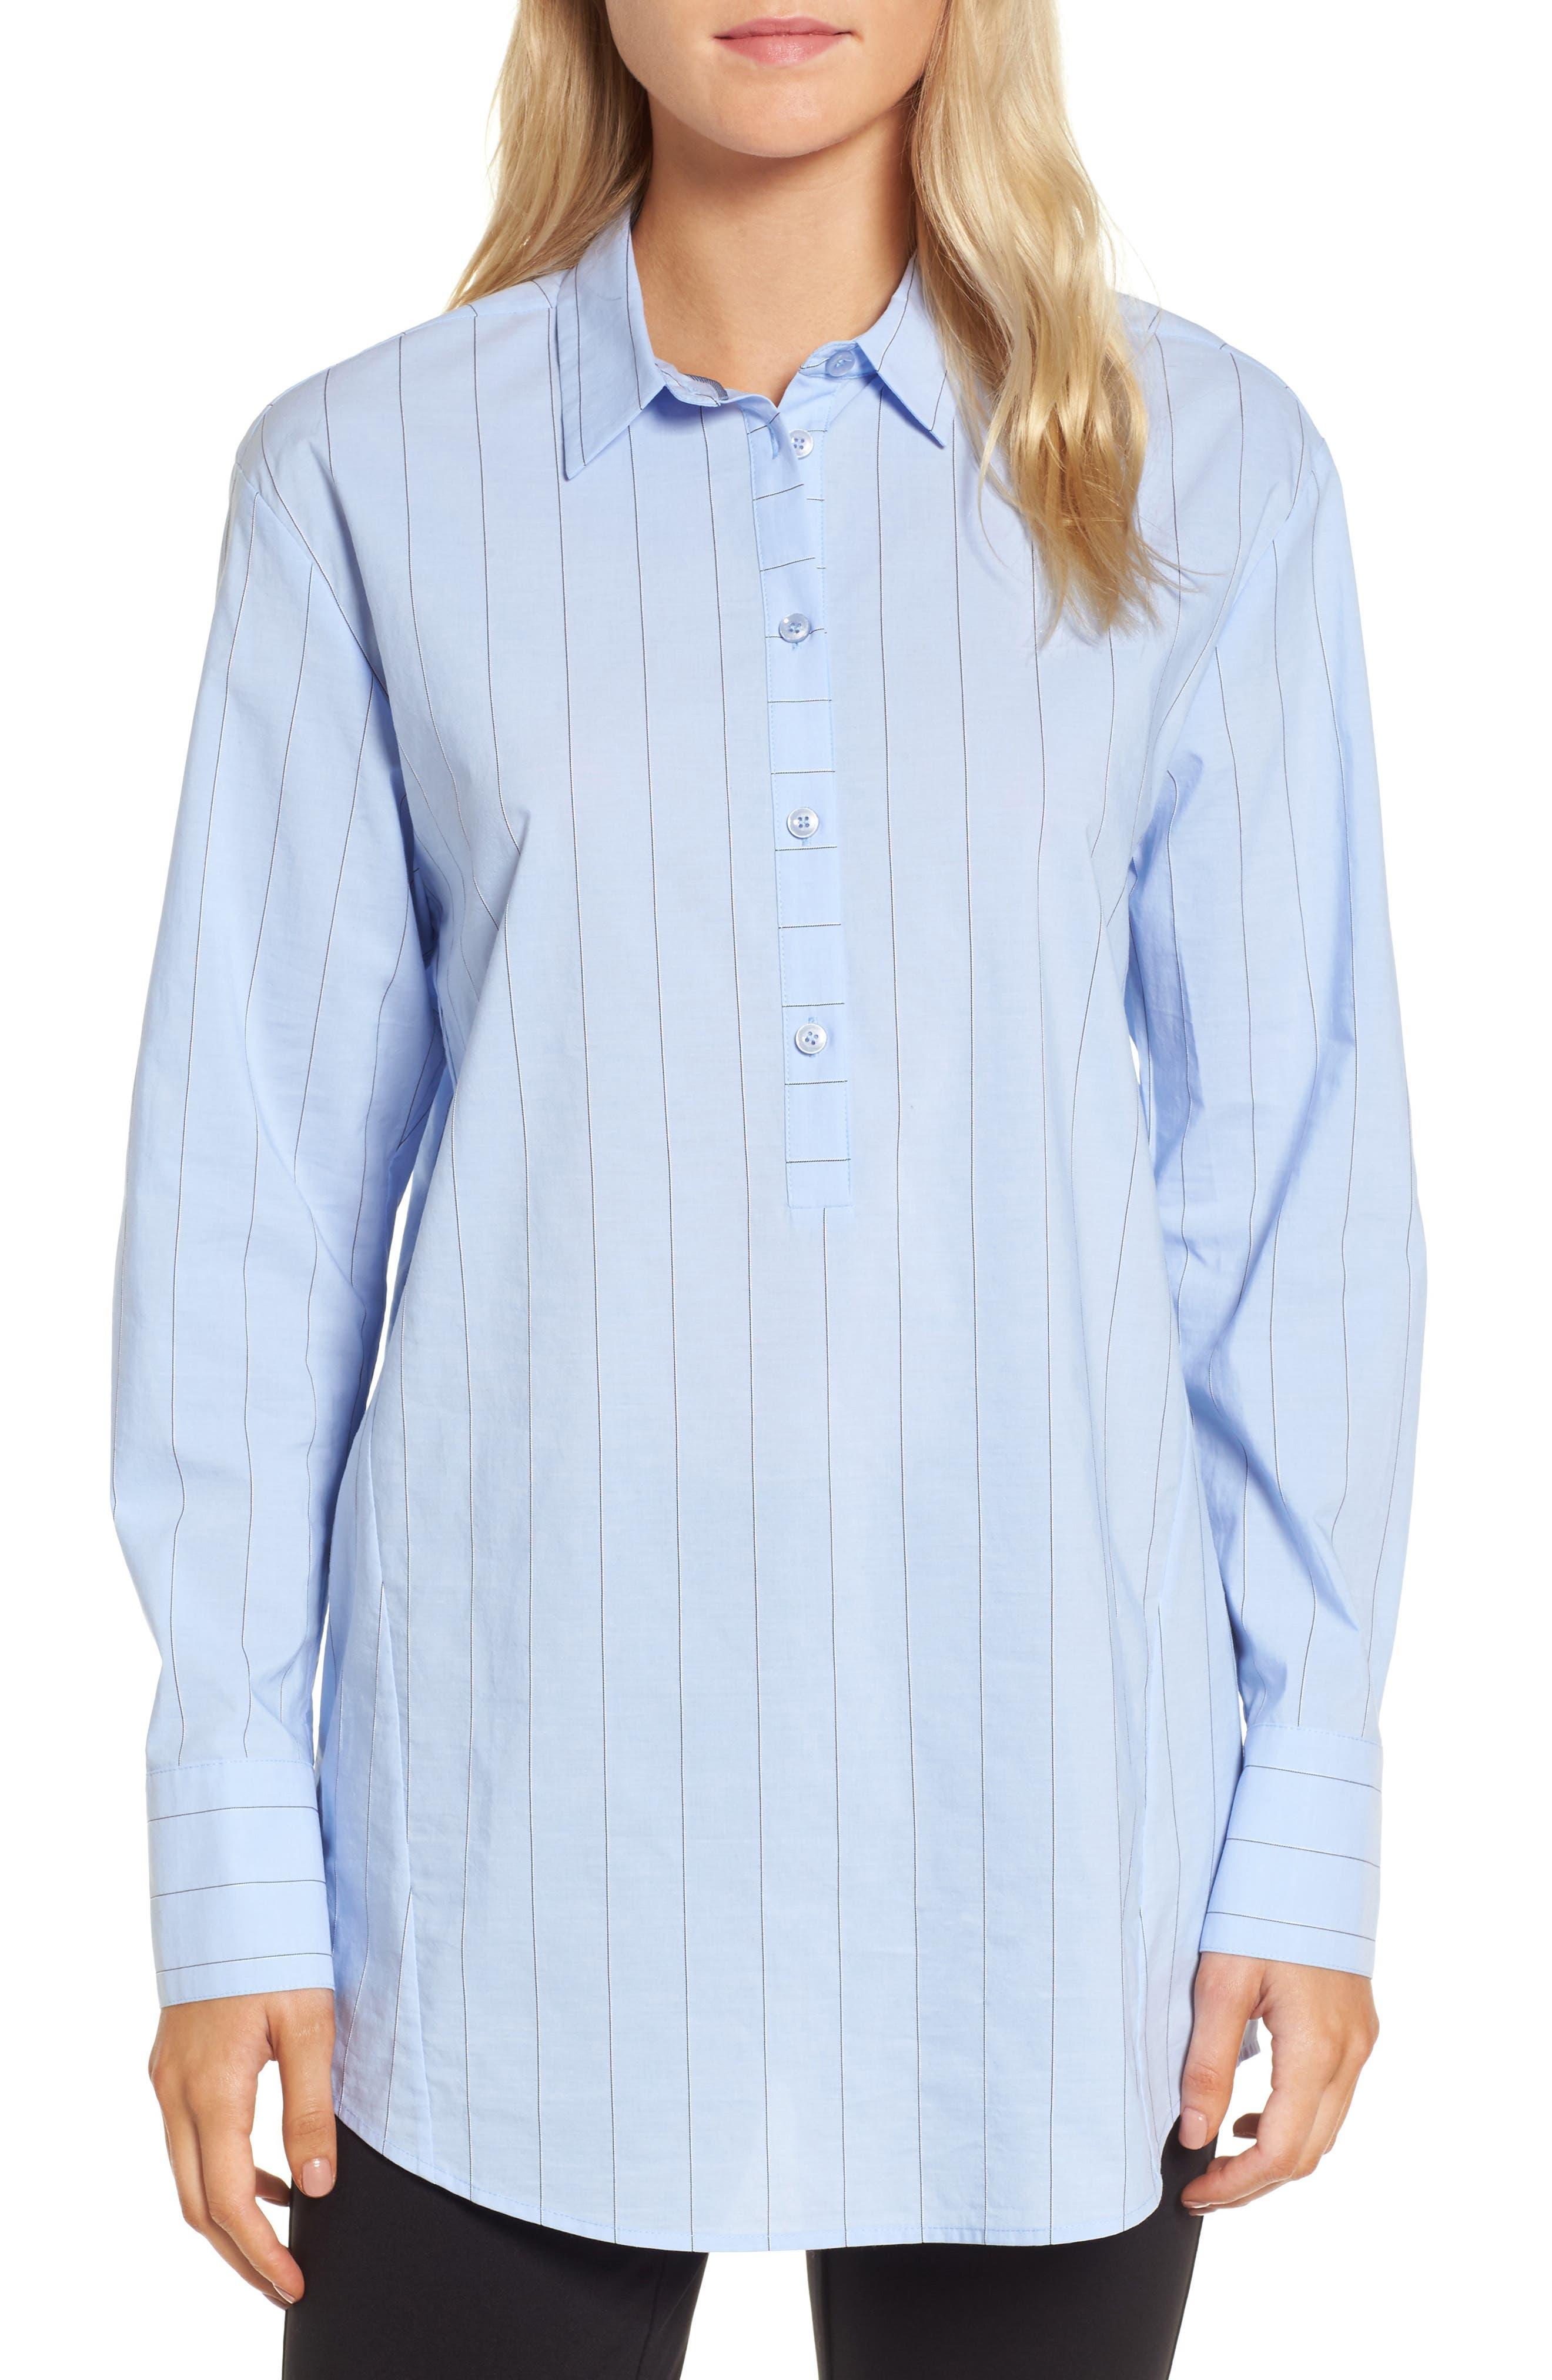 Keyhole Back Stripe Tunic Shirt,                             Main thumbnail 1, color,                             Blue Oxford Micro Stripe